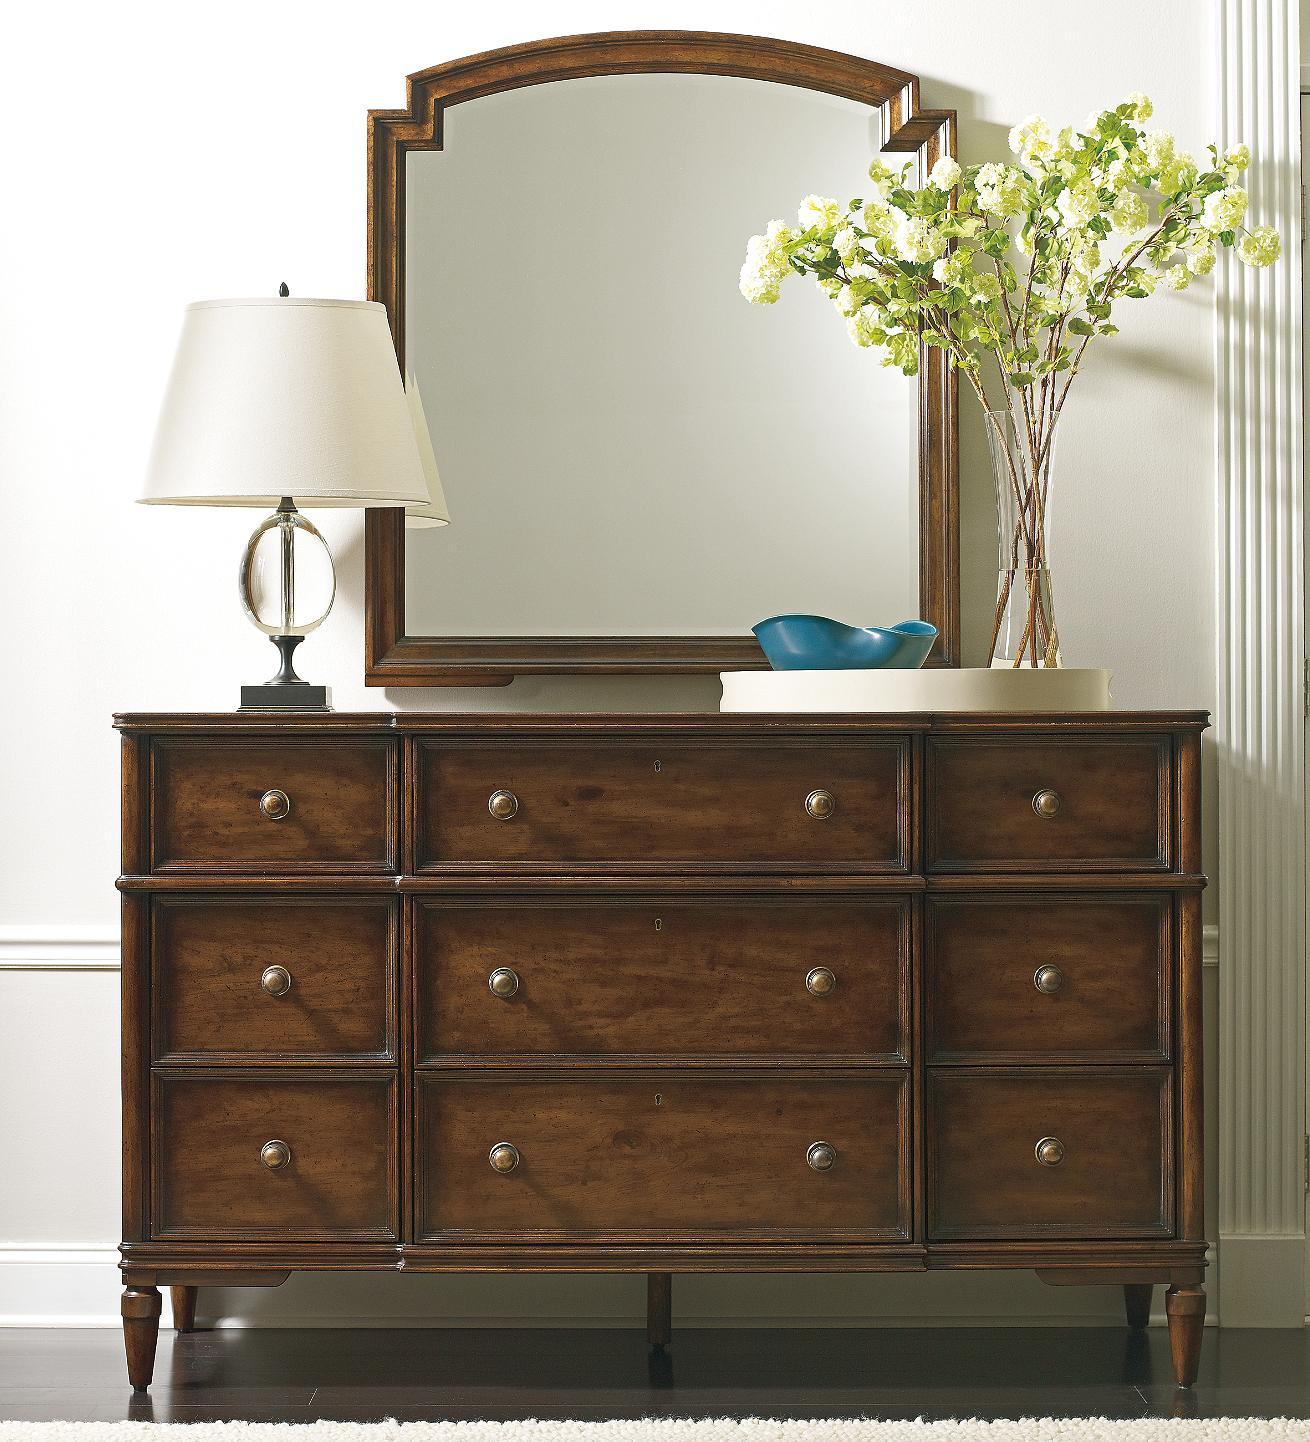 Stanley Furniture Vintage Antiqued Dresser \u0026 Mirror Set